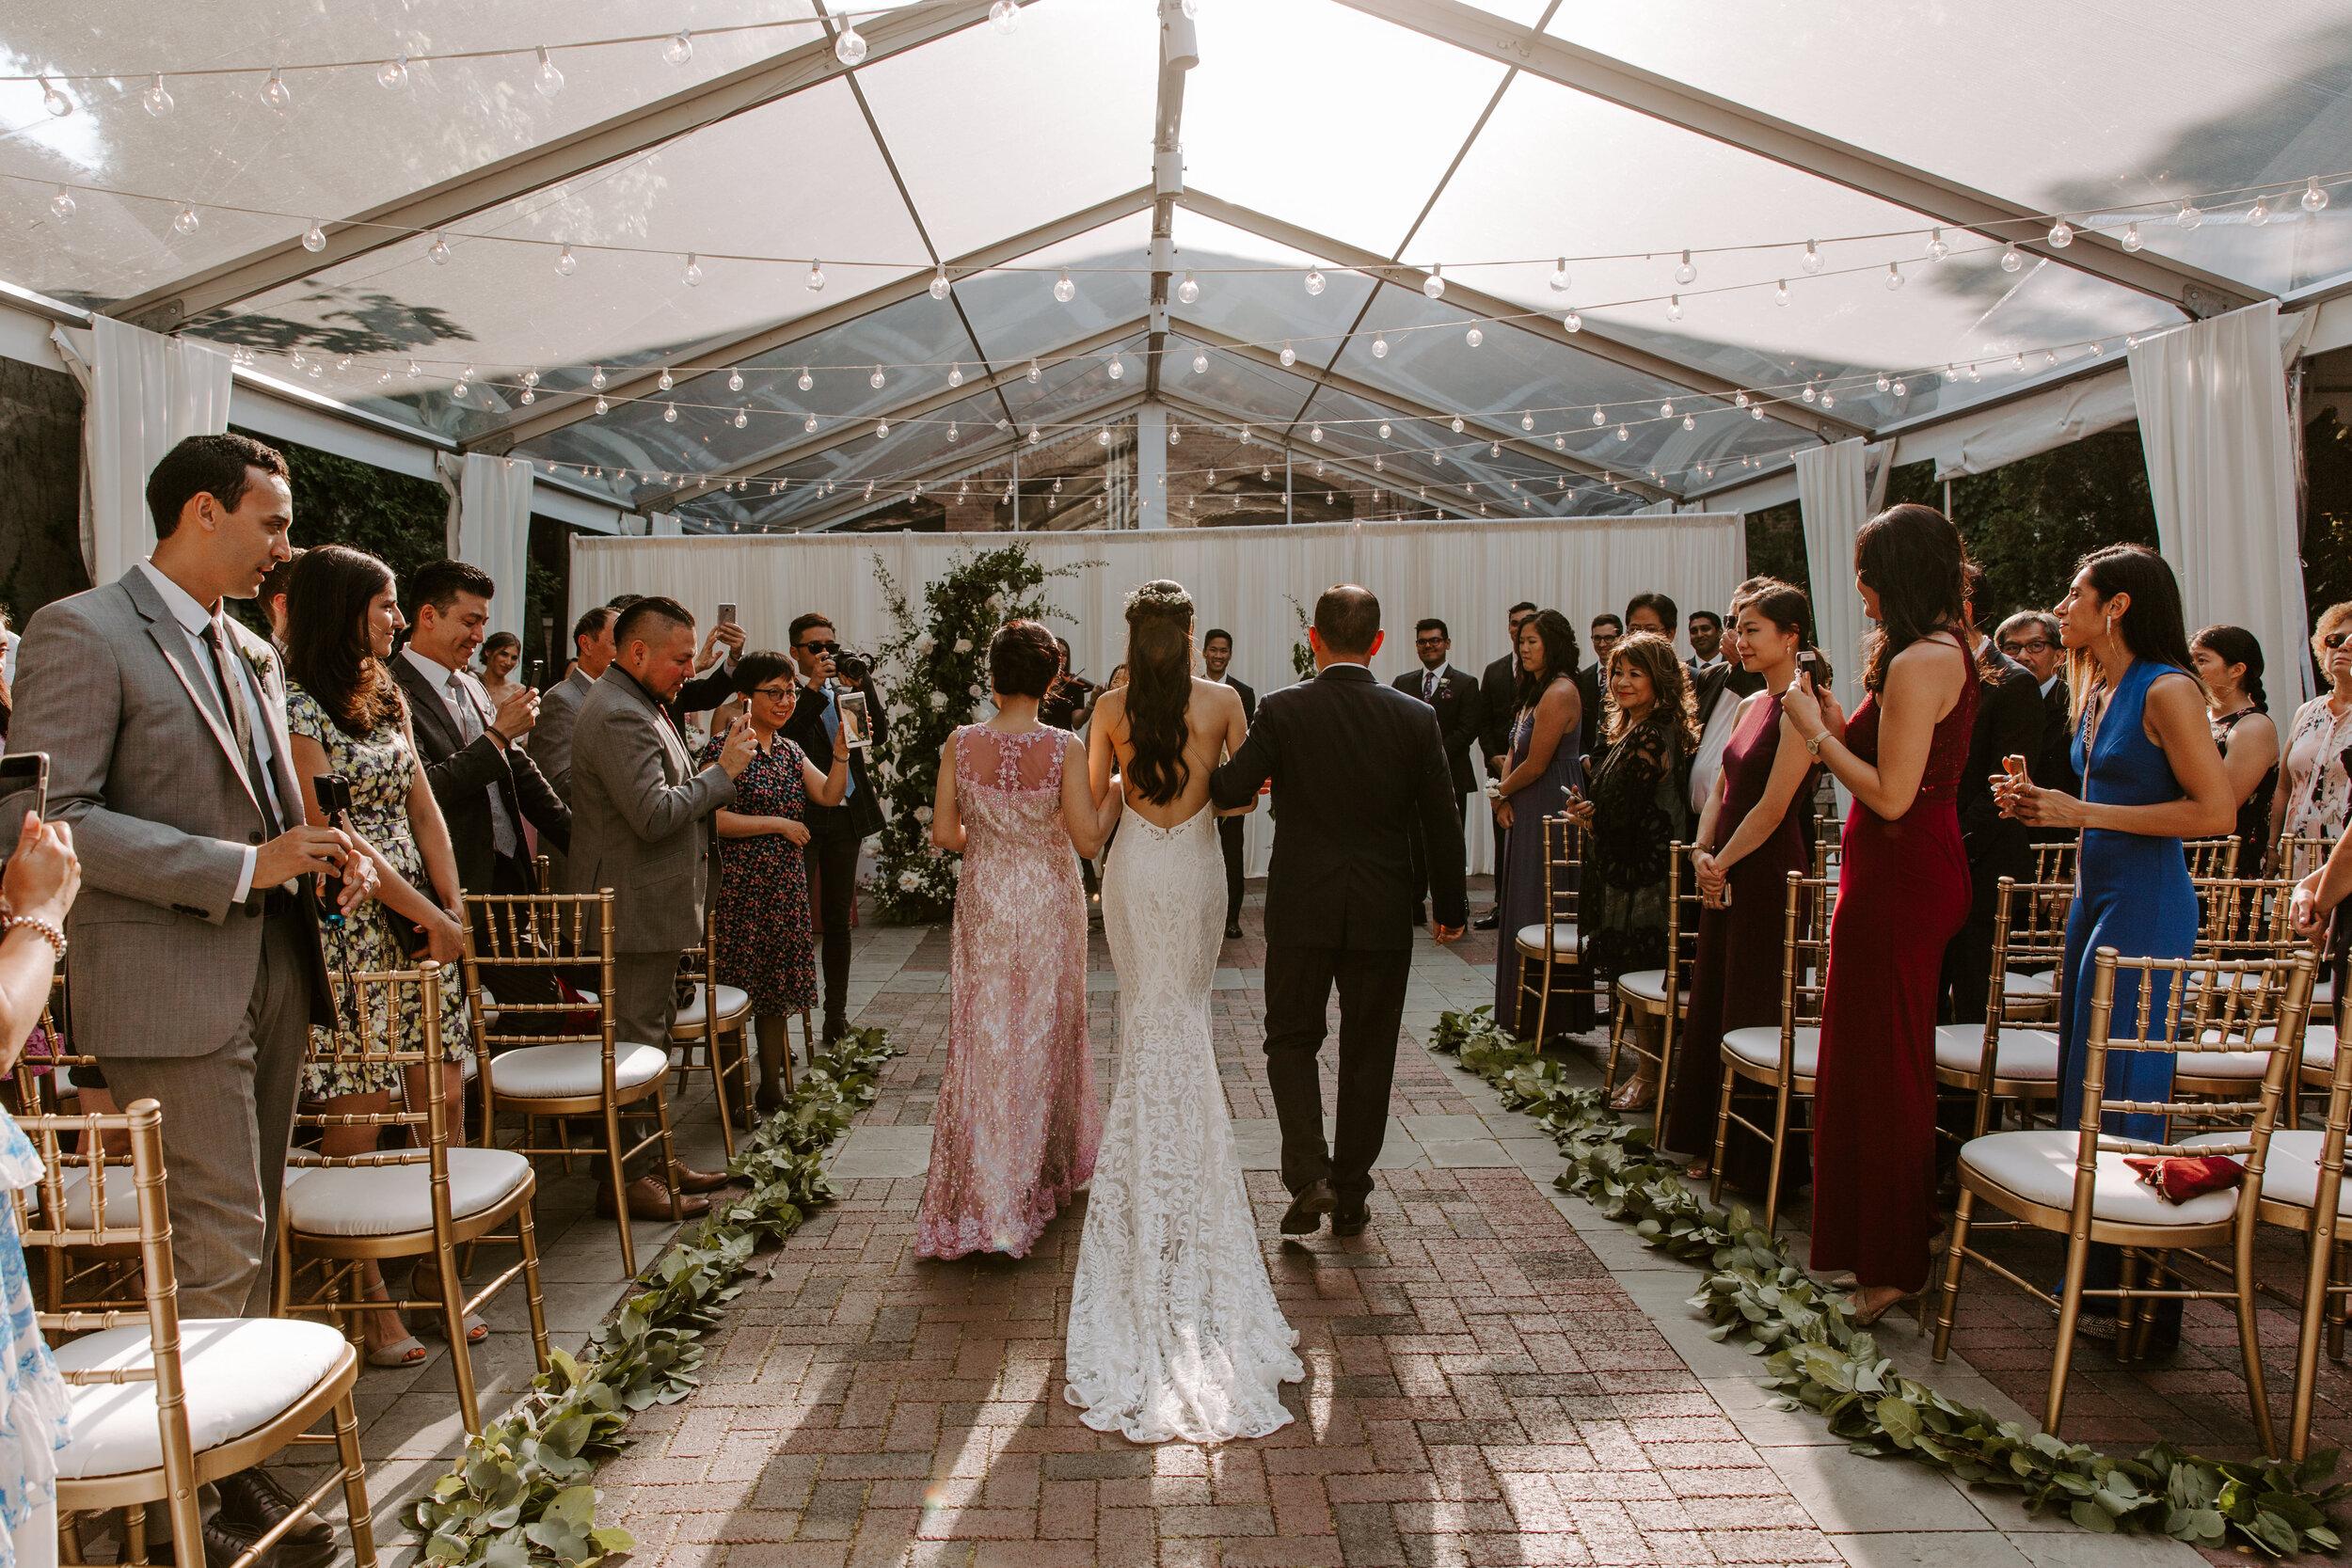 quan wedding-230.jpg